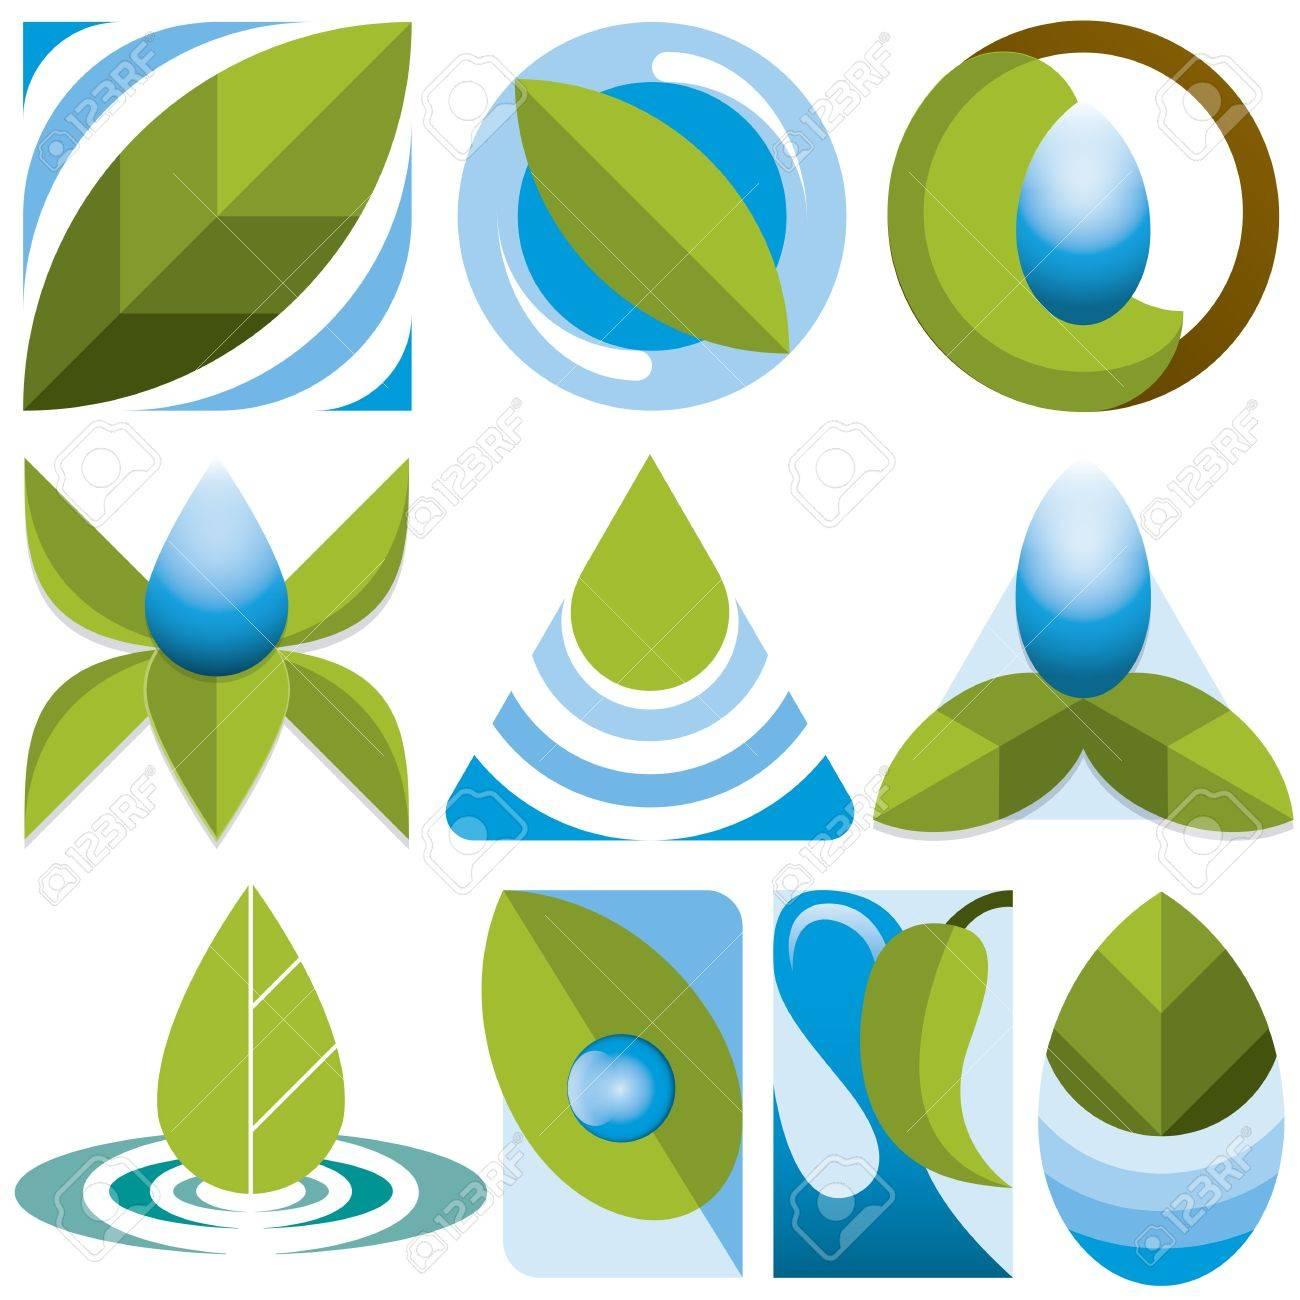 10 differents eco logos - 20614095